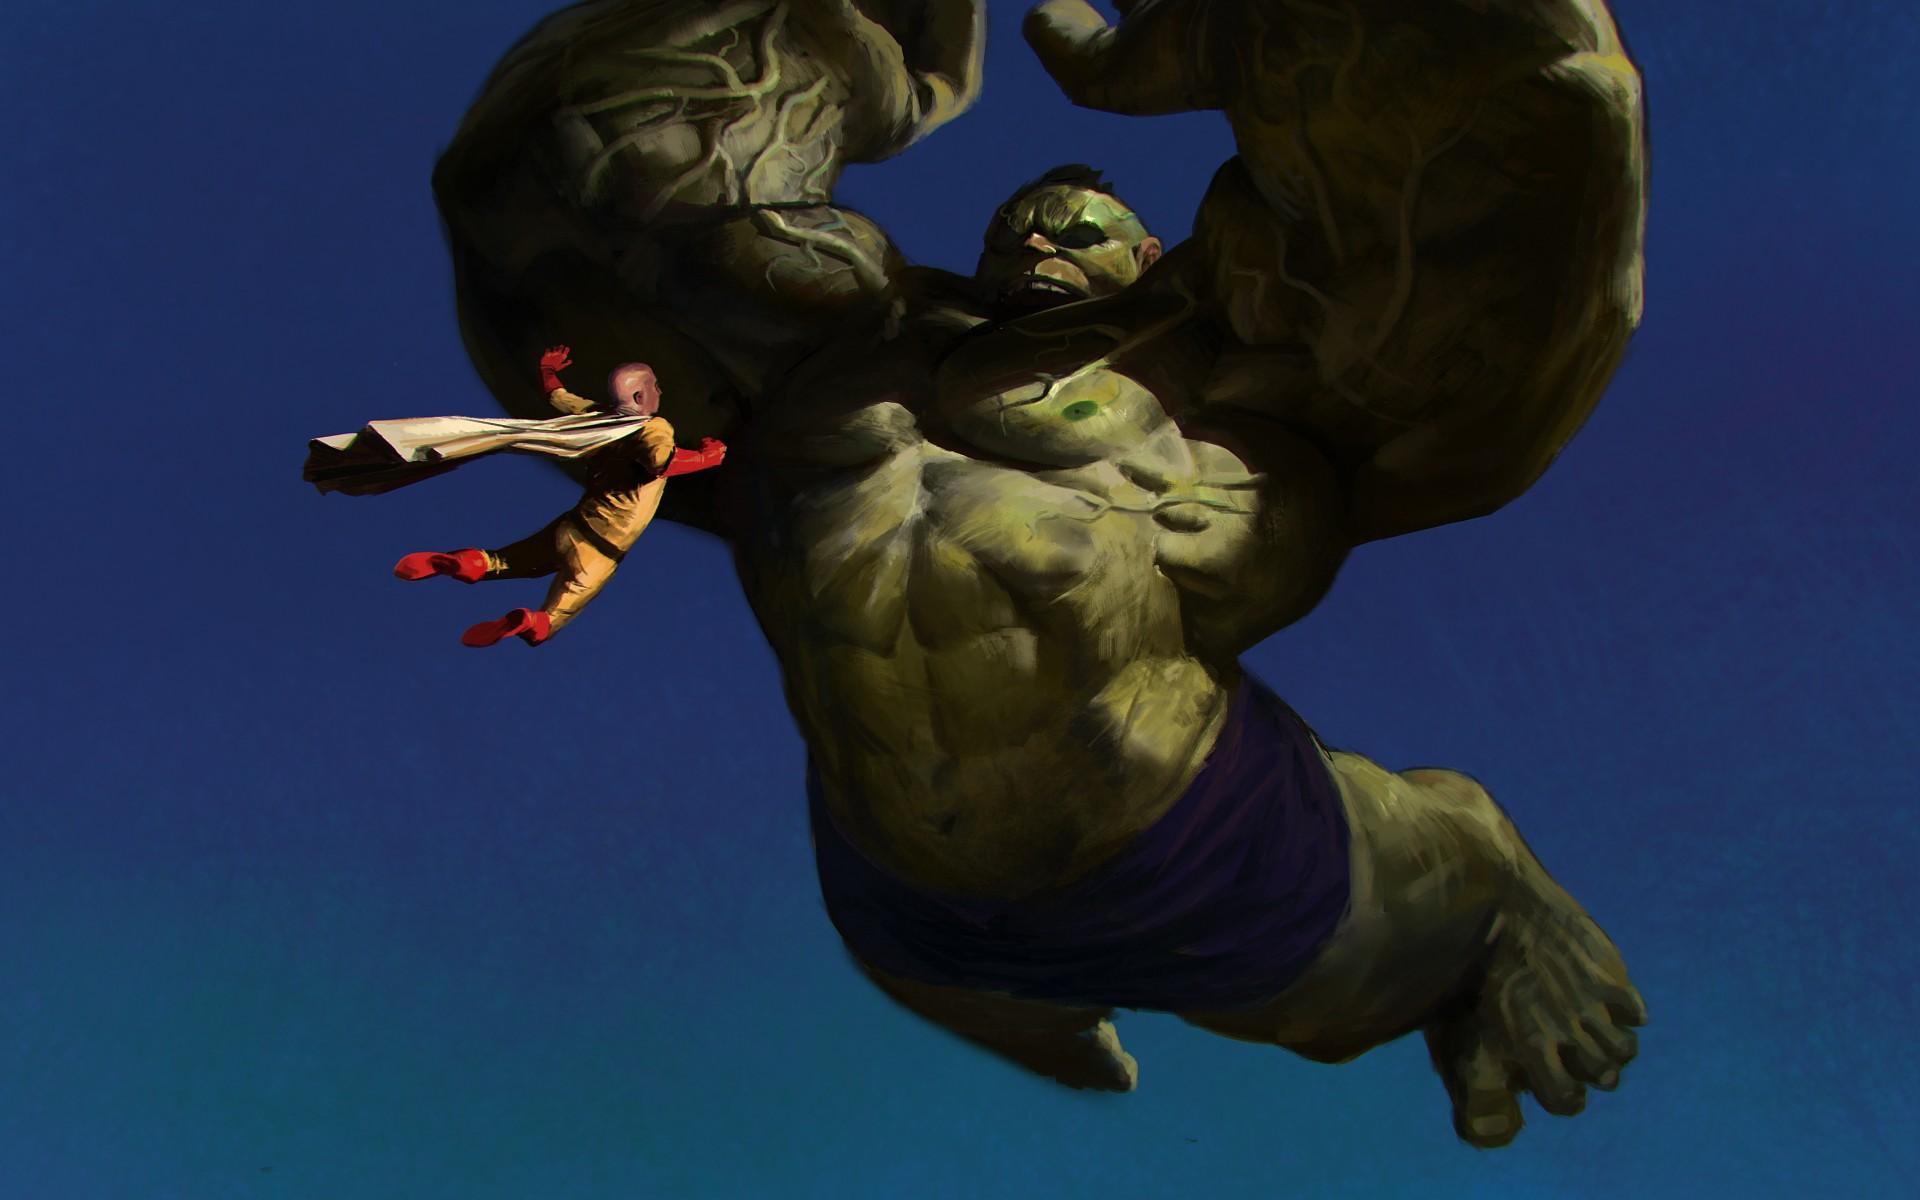 Free Download Hulk And Saitama One Punch Man Fight Fantasy Art